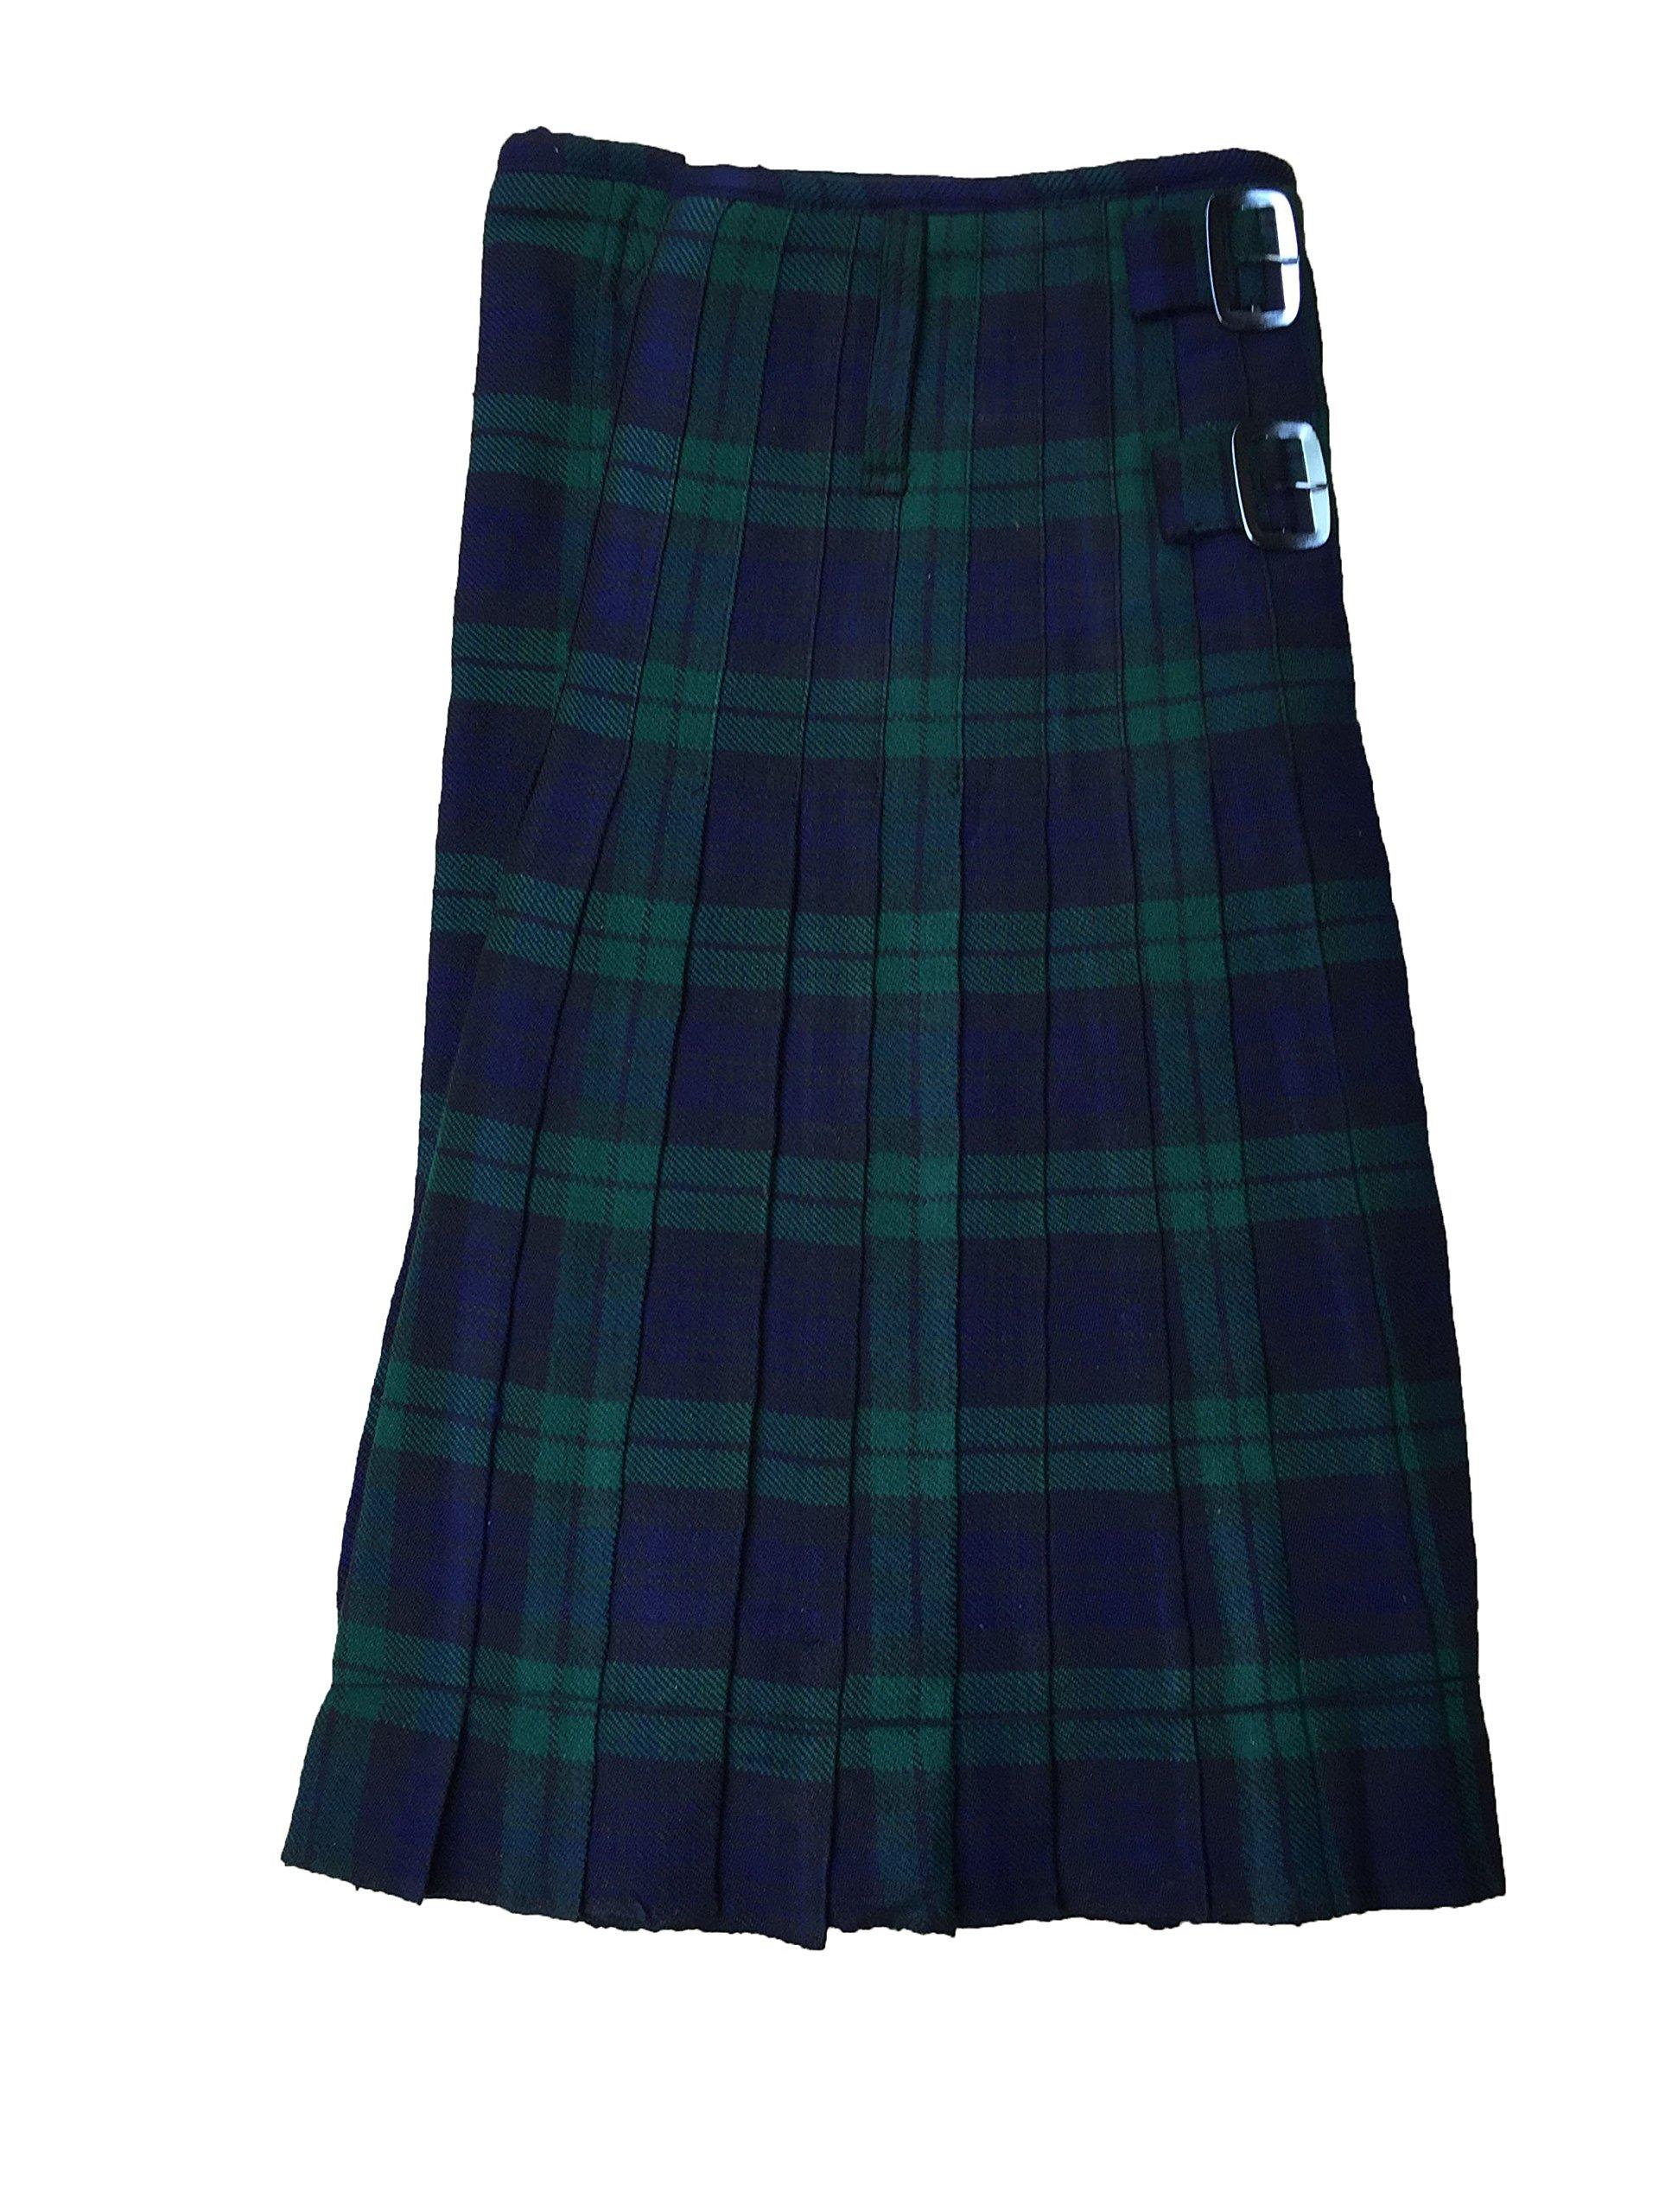 McWilliams Active Men Black Watch Scottish Highland Tartan Kilt (40, Black Watch)